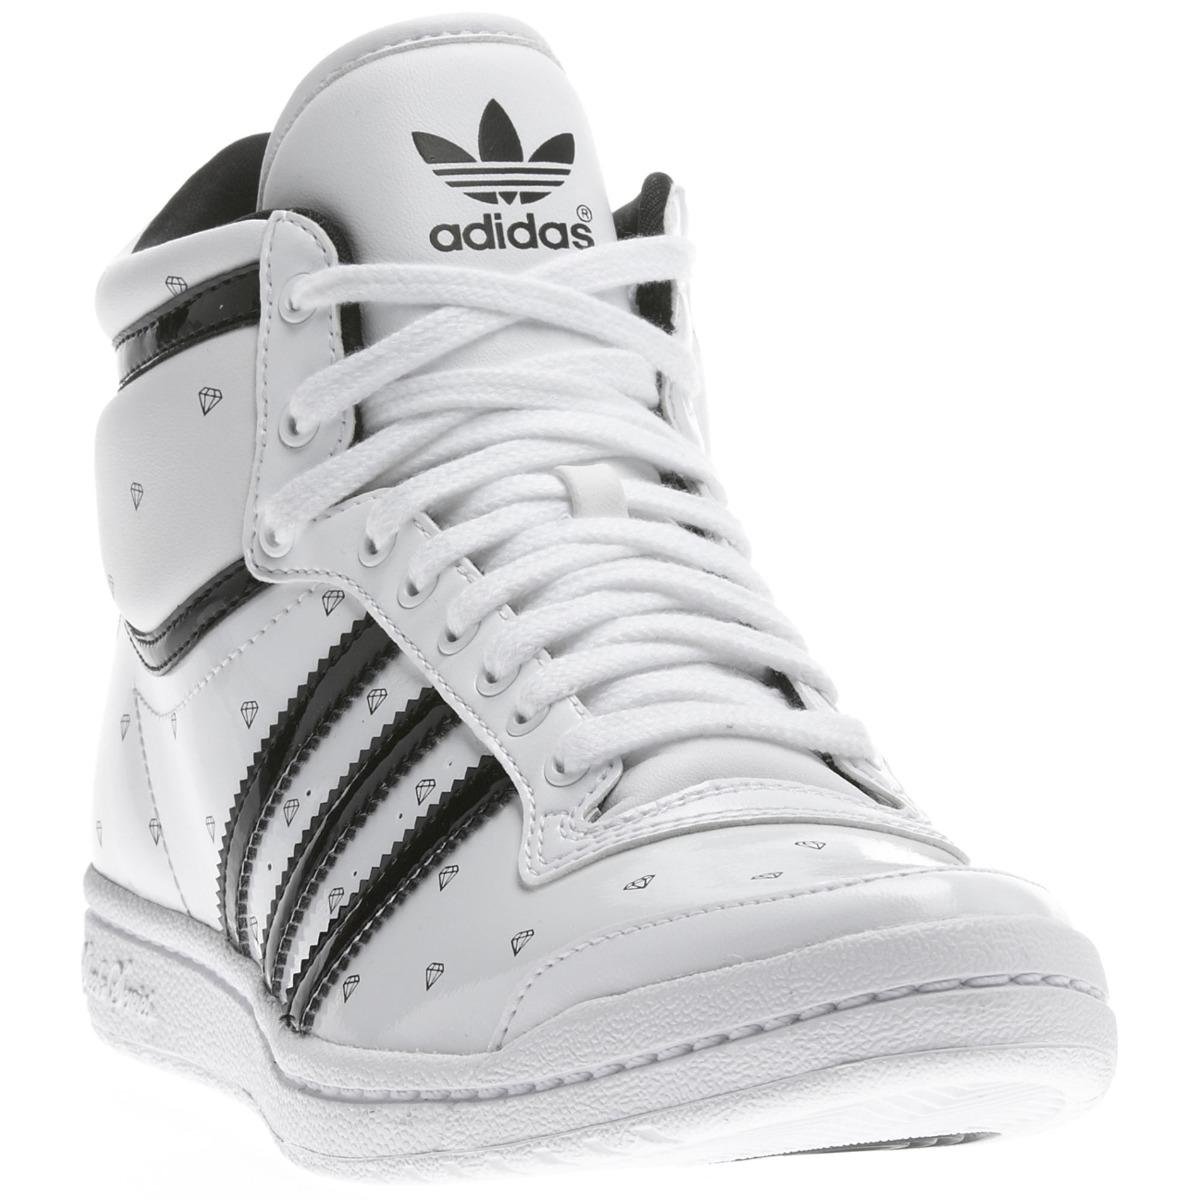 12f97a216 zapatillas adidas botas hombre argentina